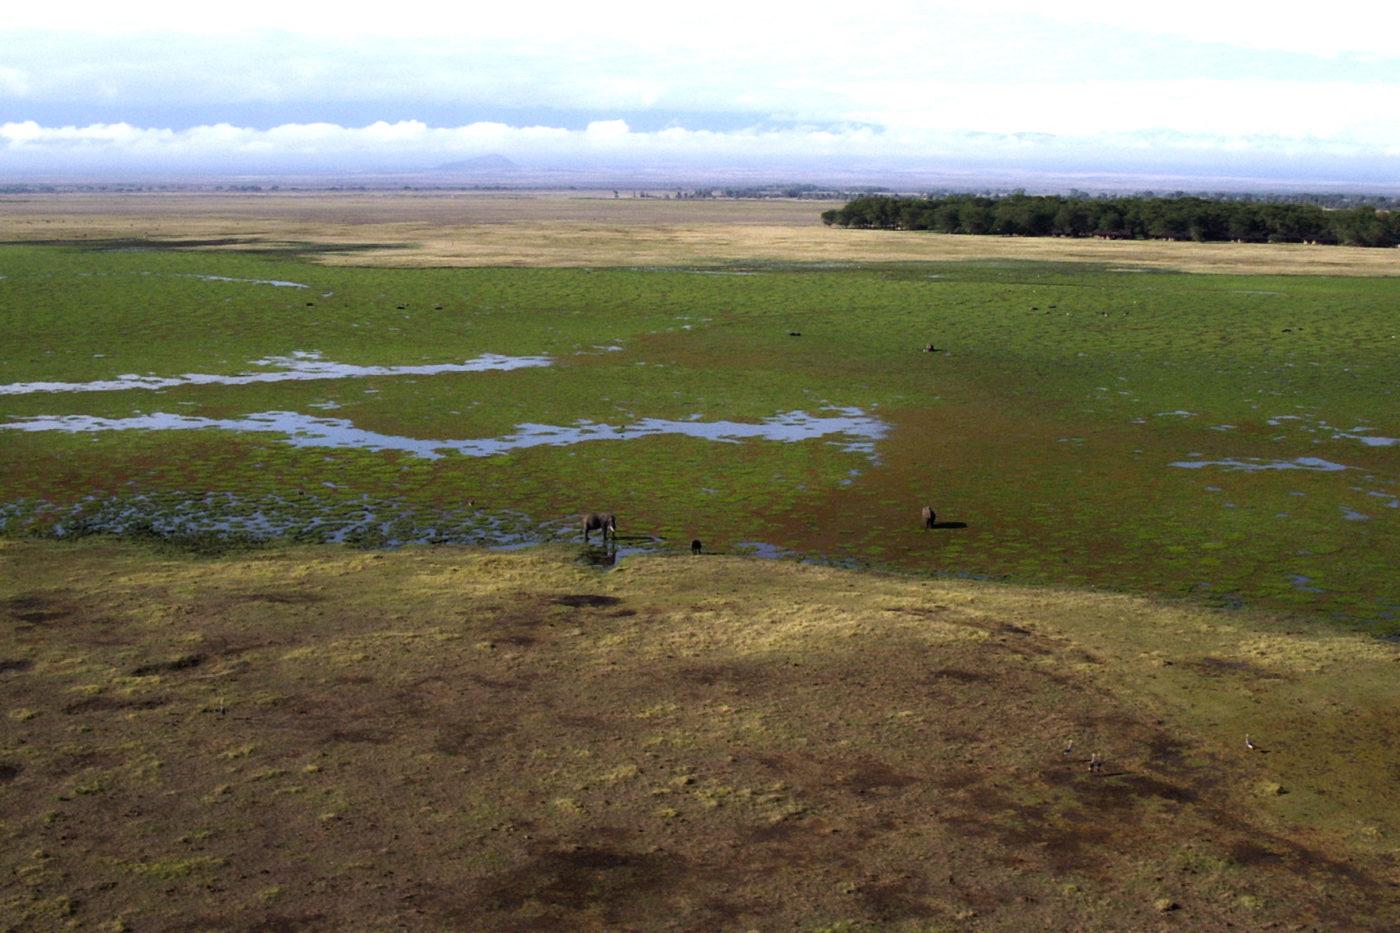 Elephants in Tsavo National Park Kenya